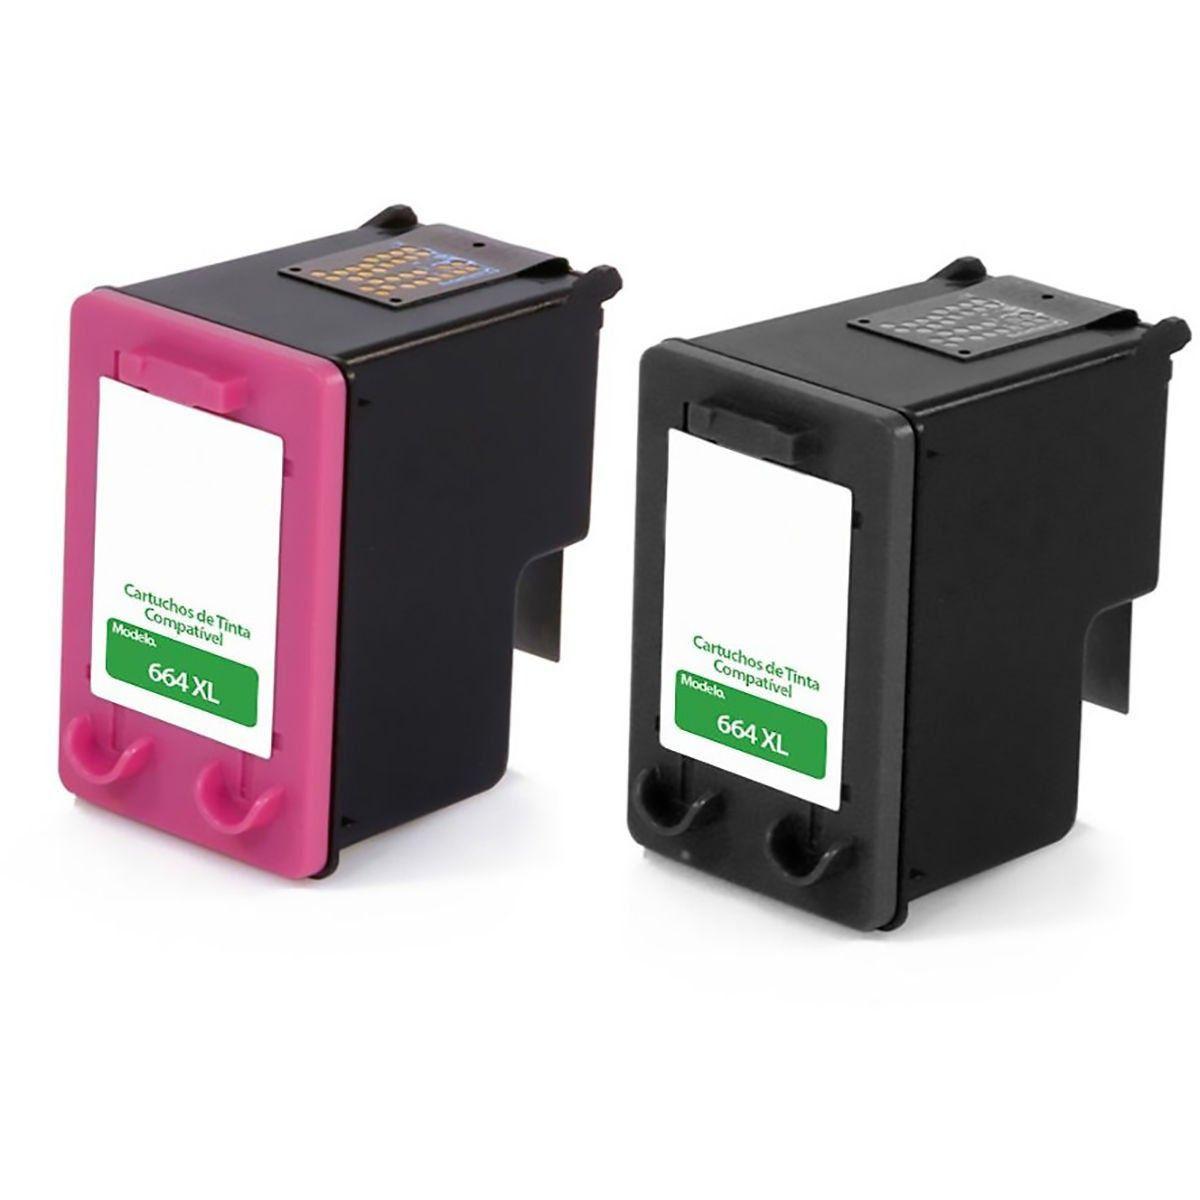 Compatível: Kit Colorido de Cartucho de Tinta 664xl 664 para HP Ink Advantage 1115 2136 3635 3636 3836 3776 4676